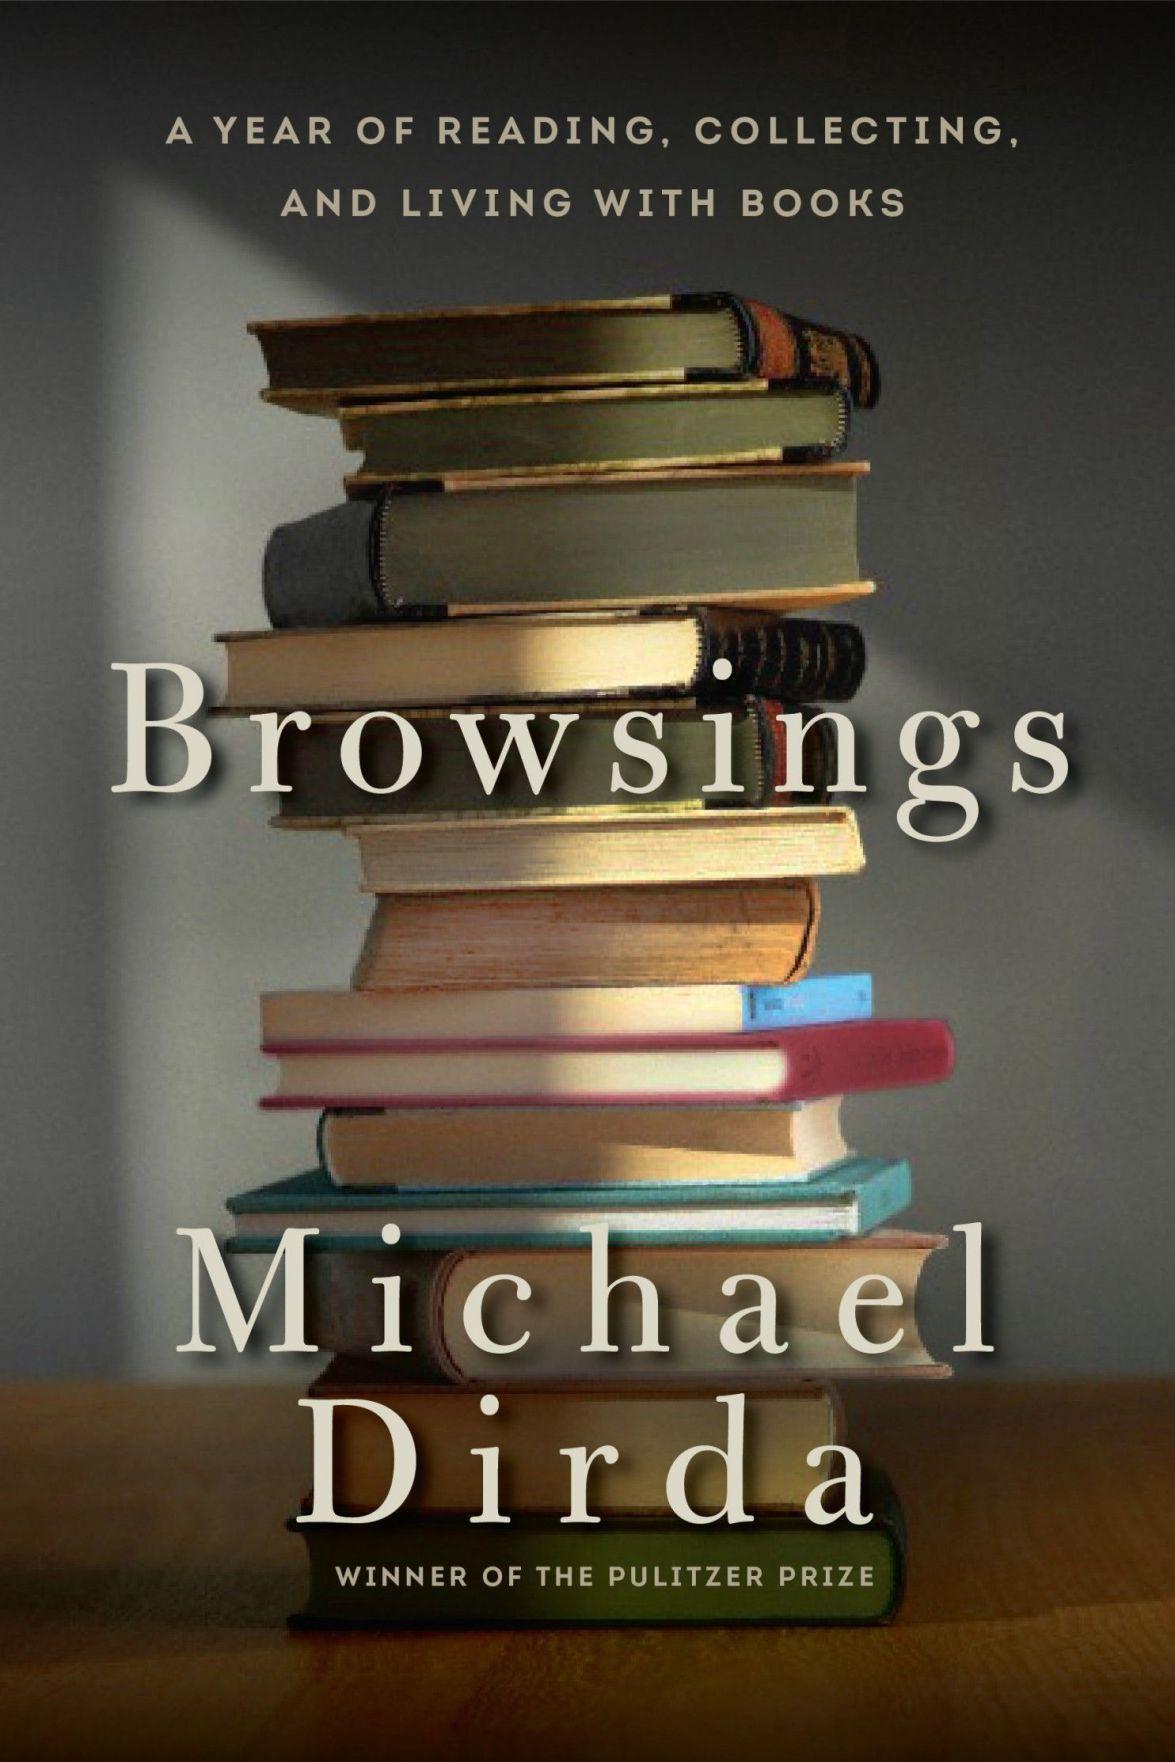 Conversational essays by Michael Dirda